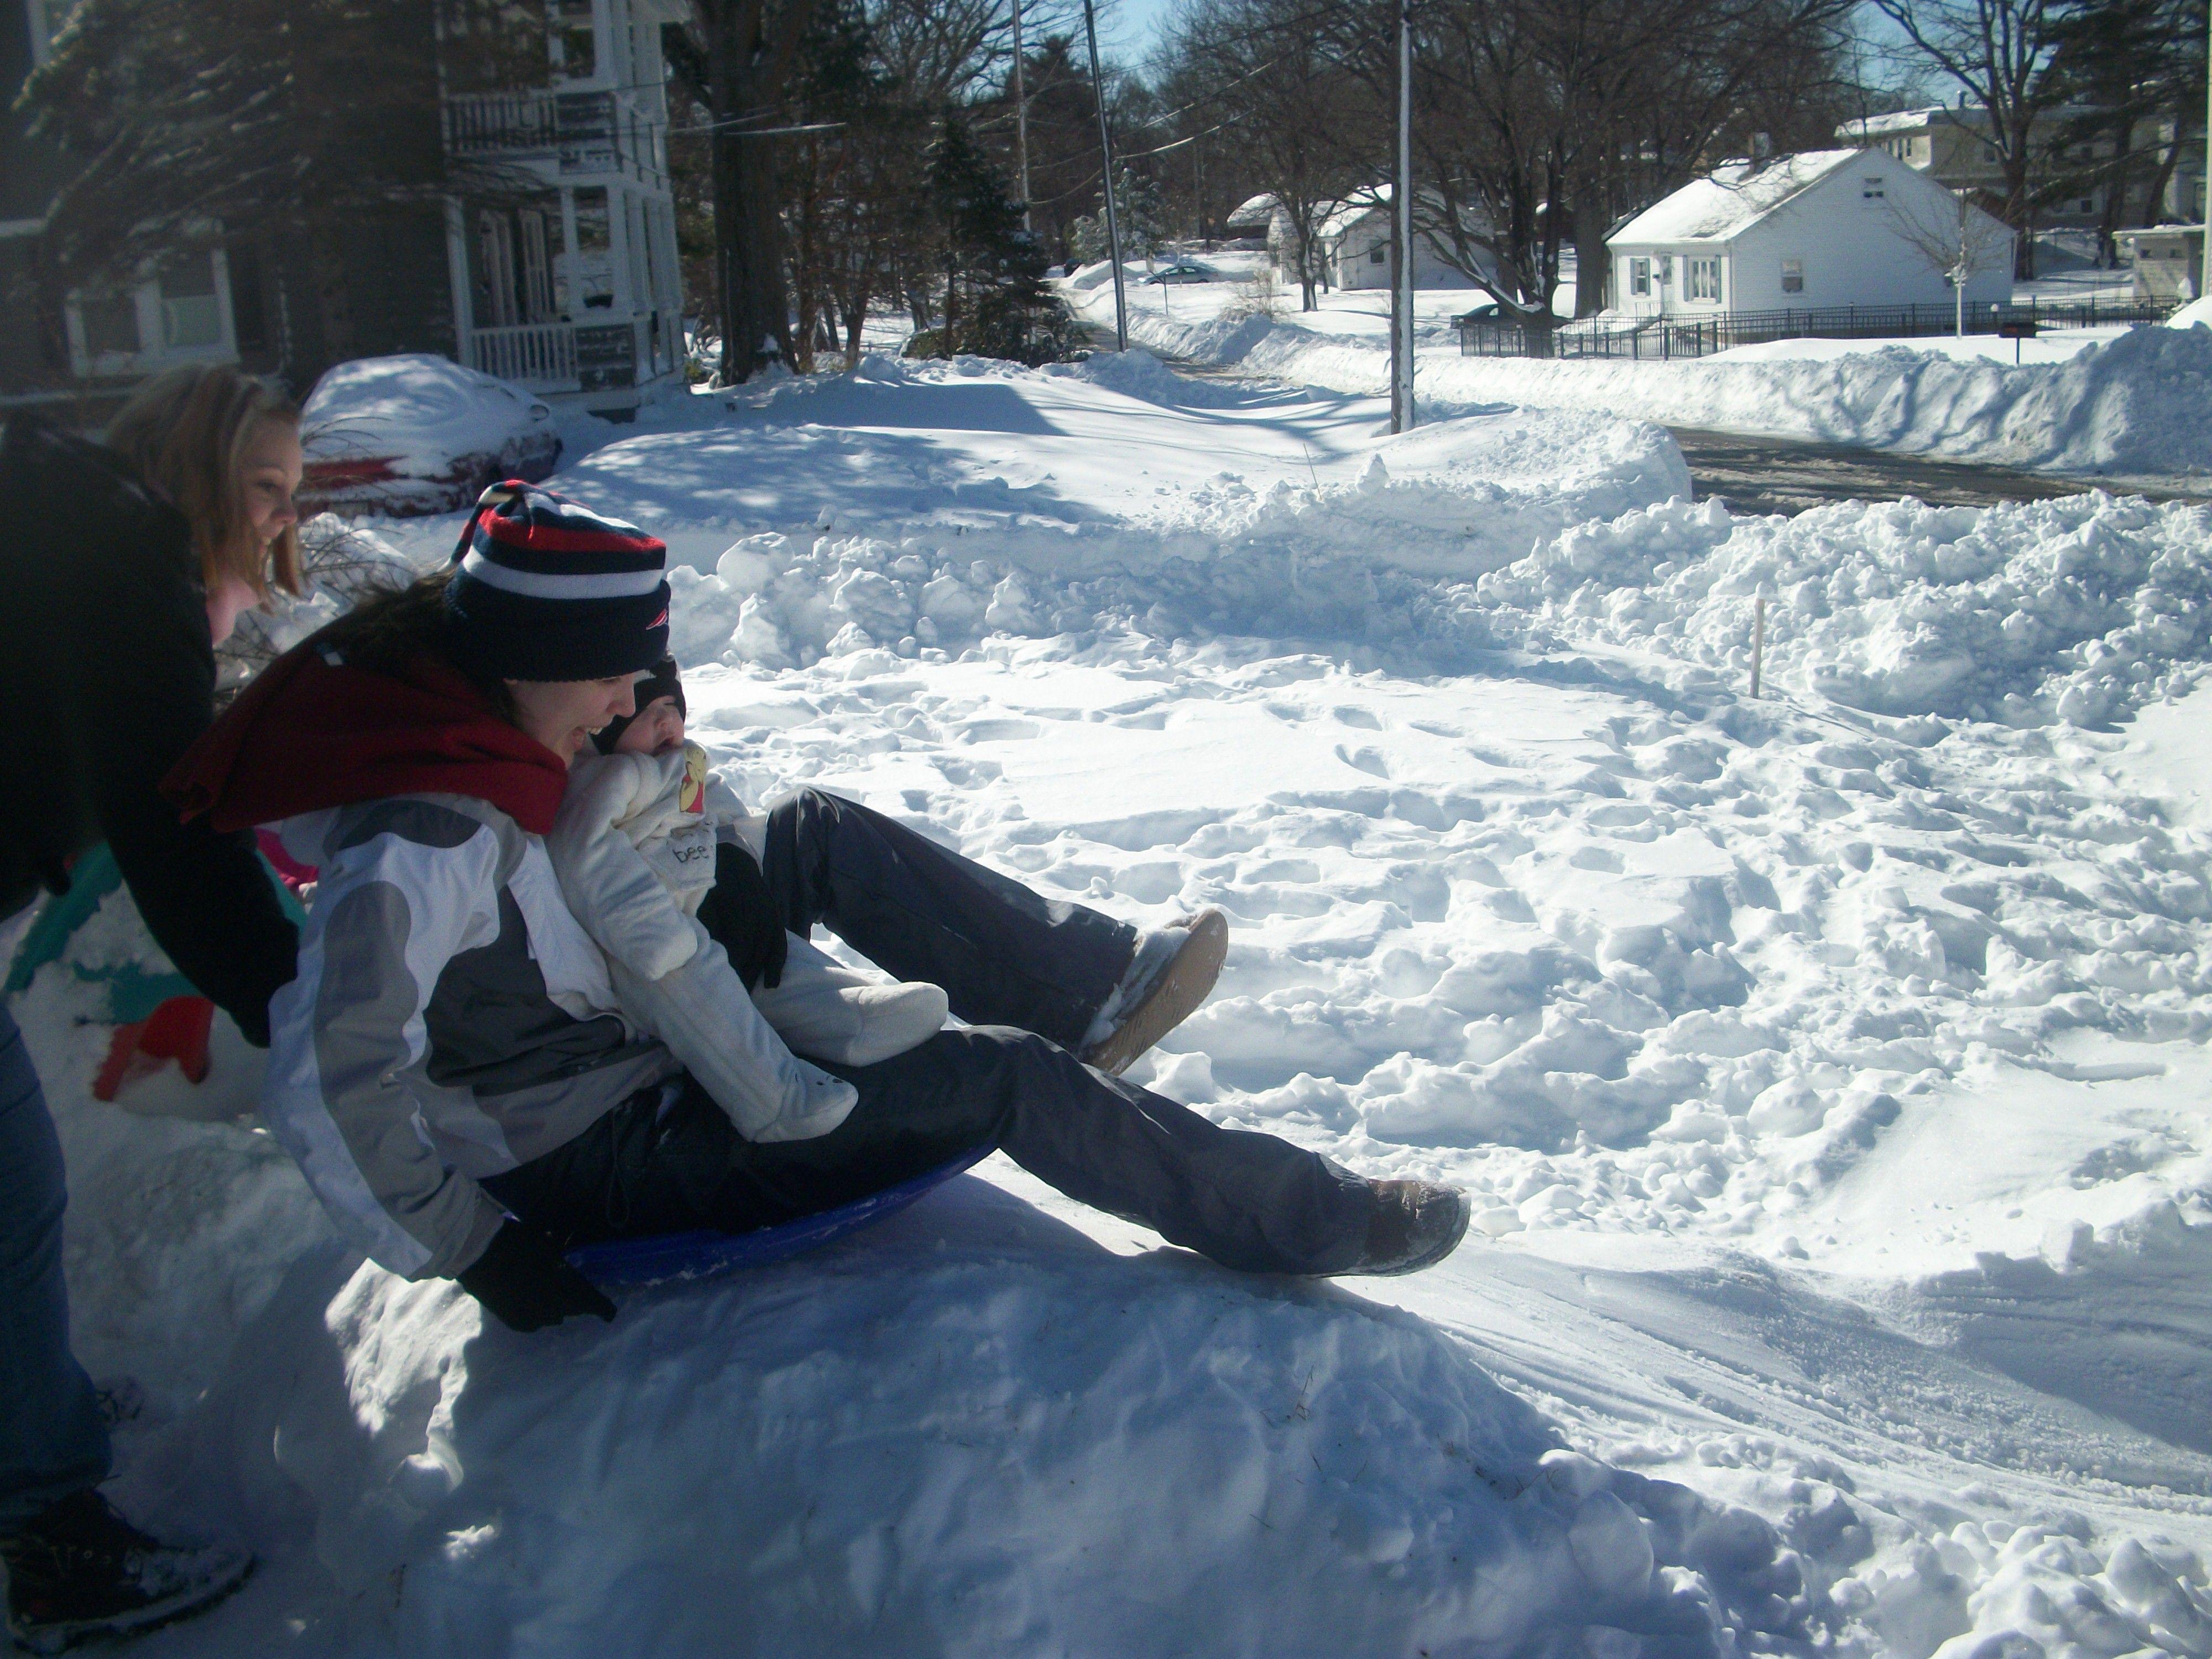 My gf @Kristen Klegraefe giving my boy & I a shove down the sledding ramp <3